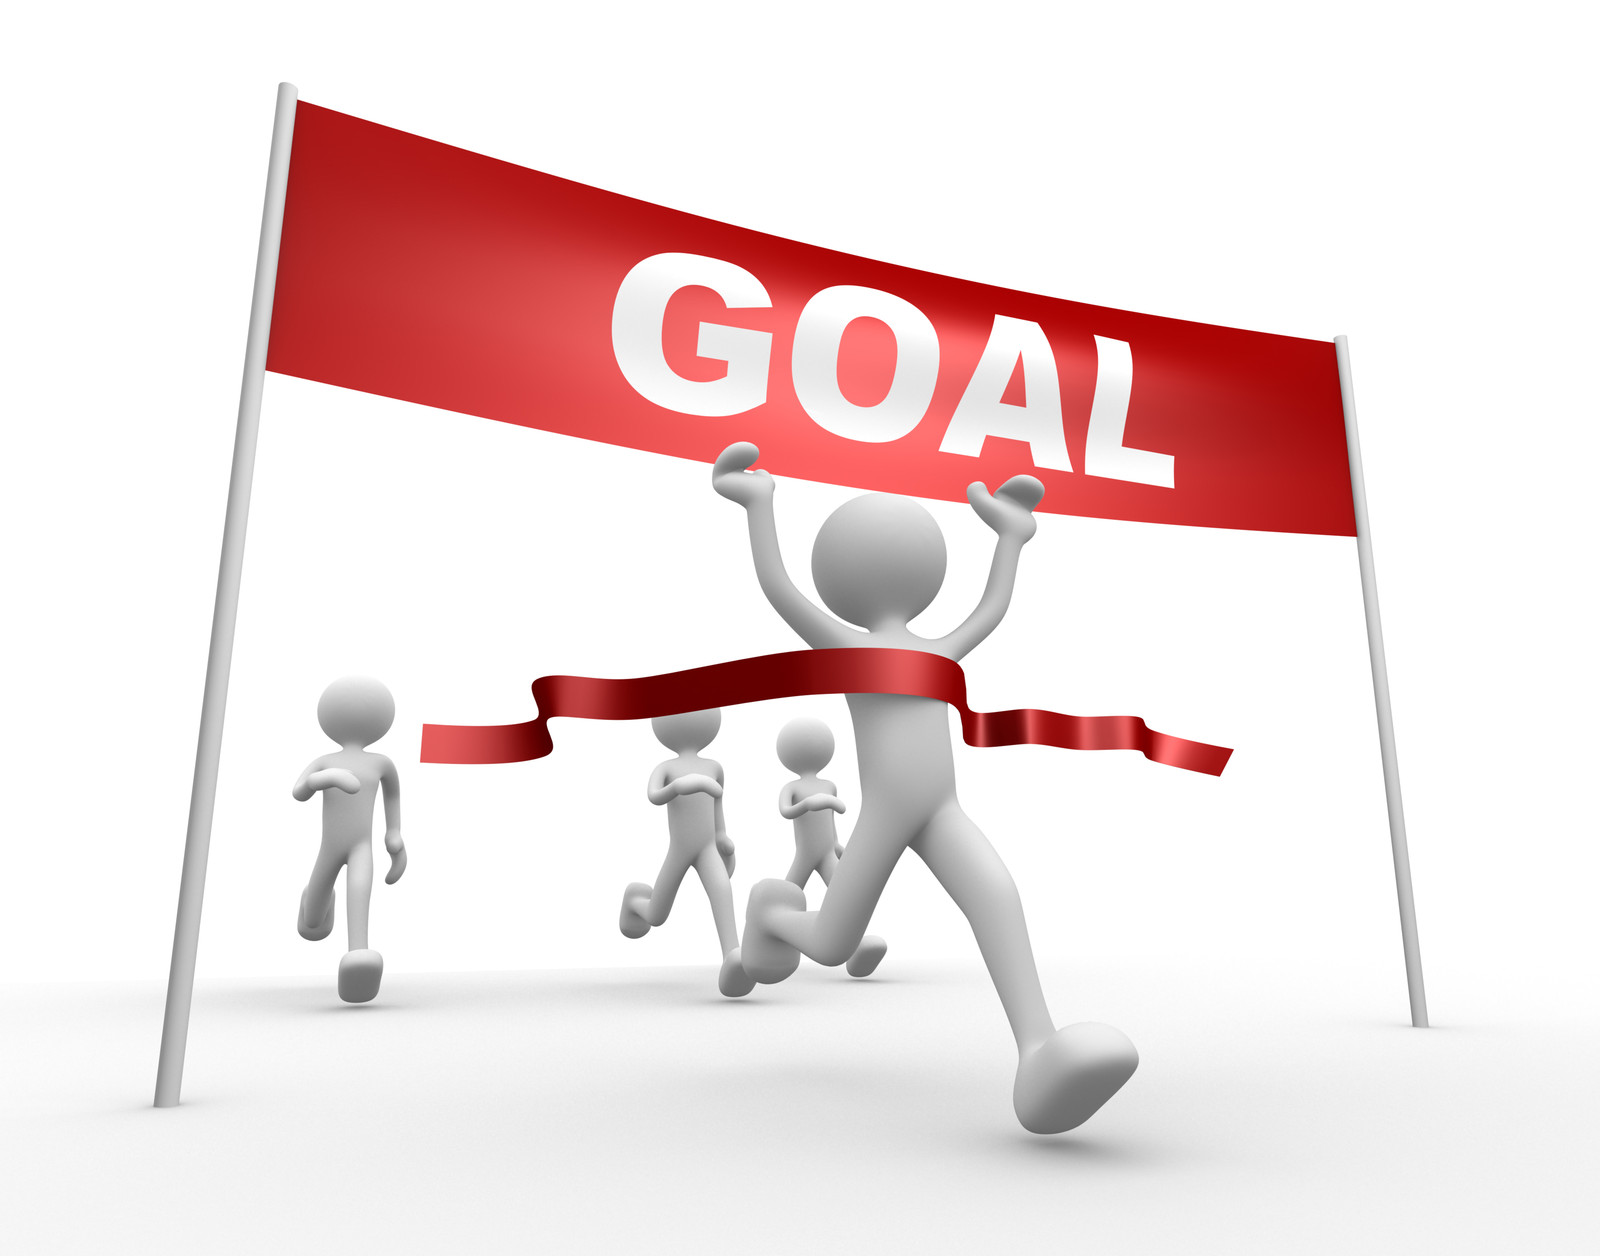 hight resolution of meeting goals clipart